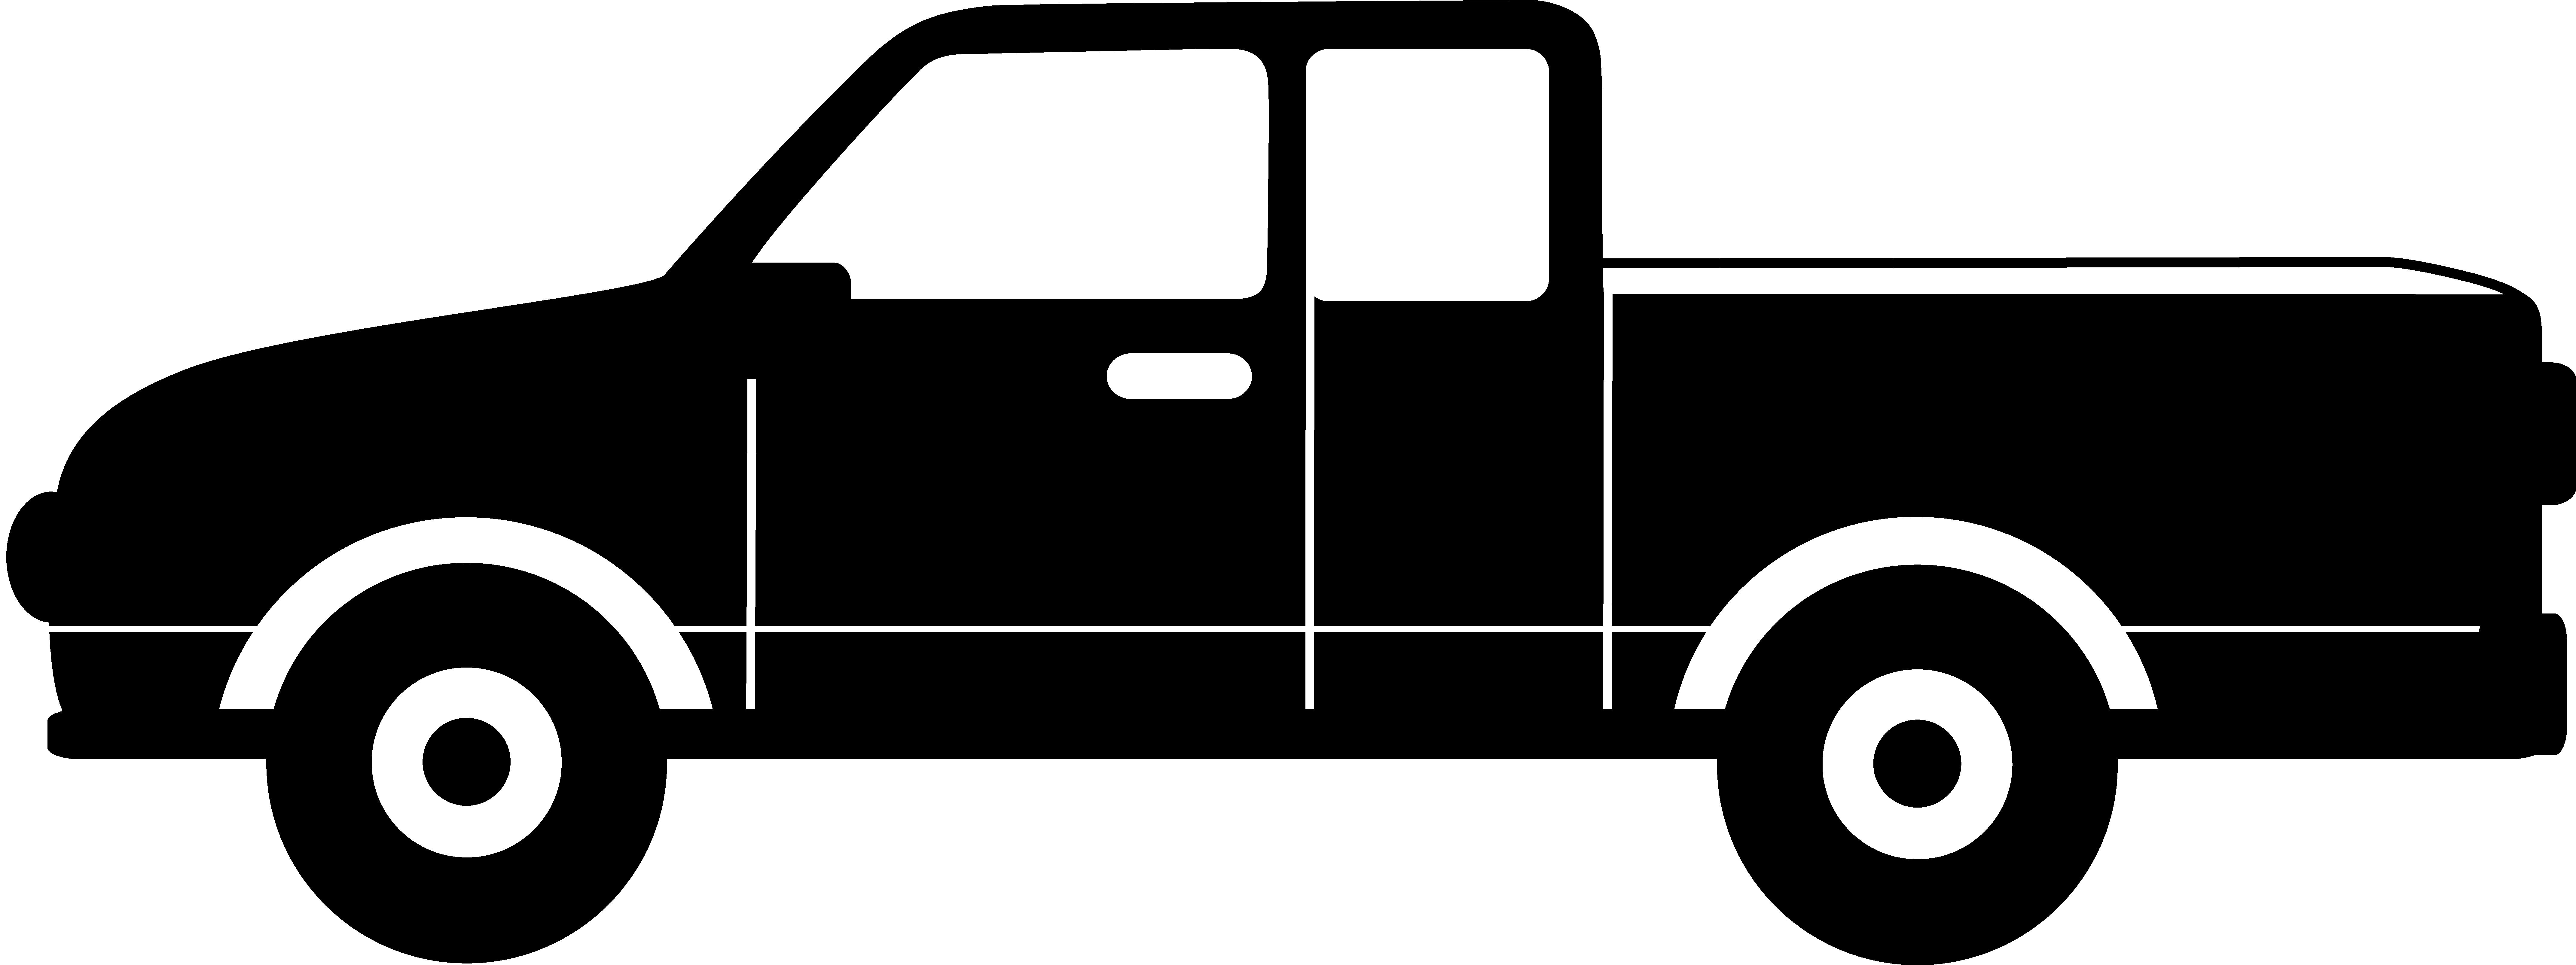 Black Pickup Truck Silhouette.